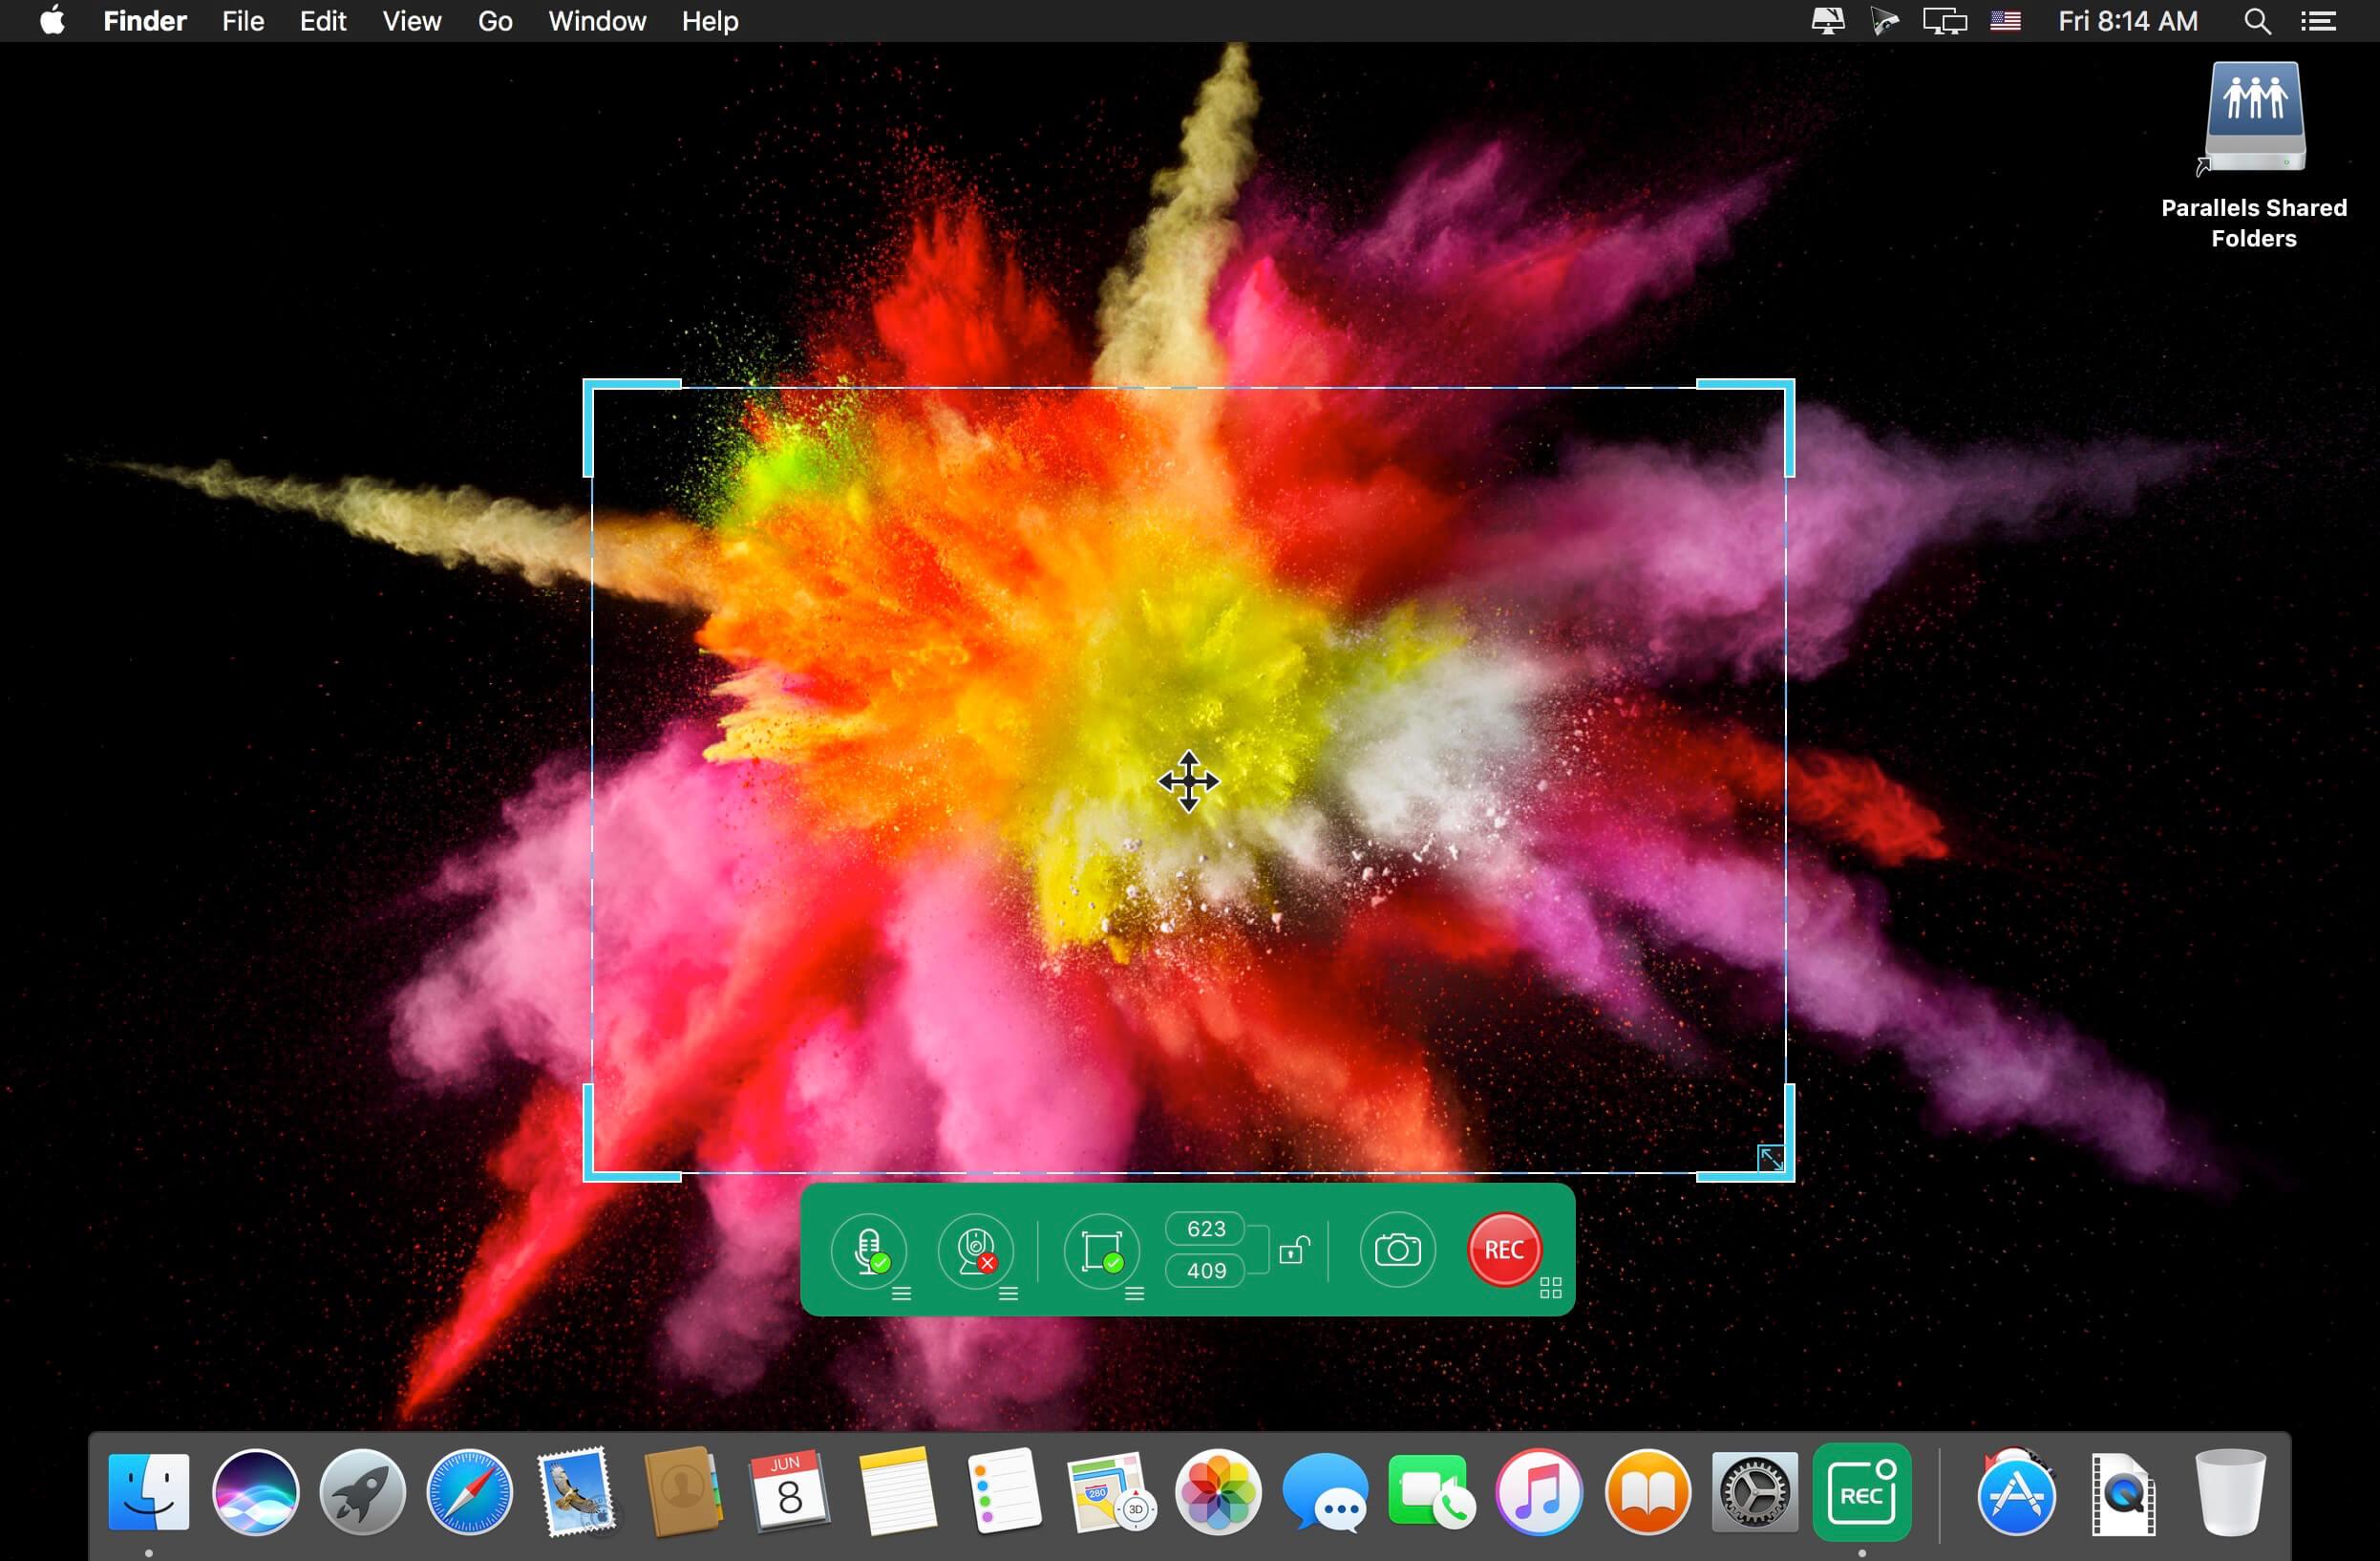 Apeaksoft Screen Recorder for Mac 1 0 8 download | macOS